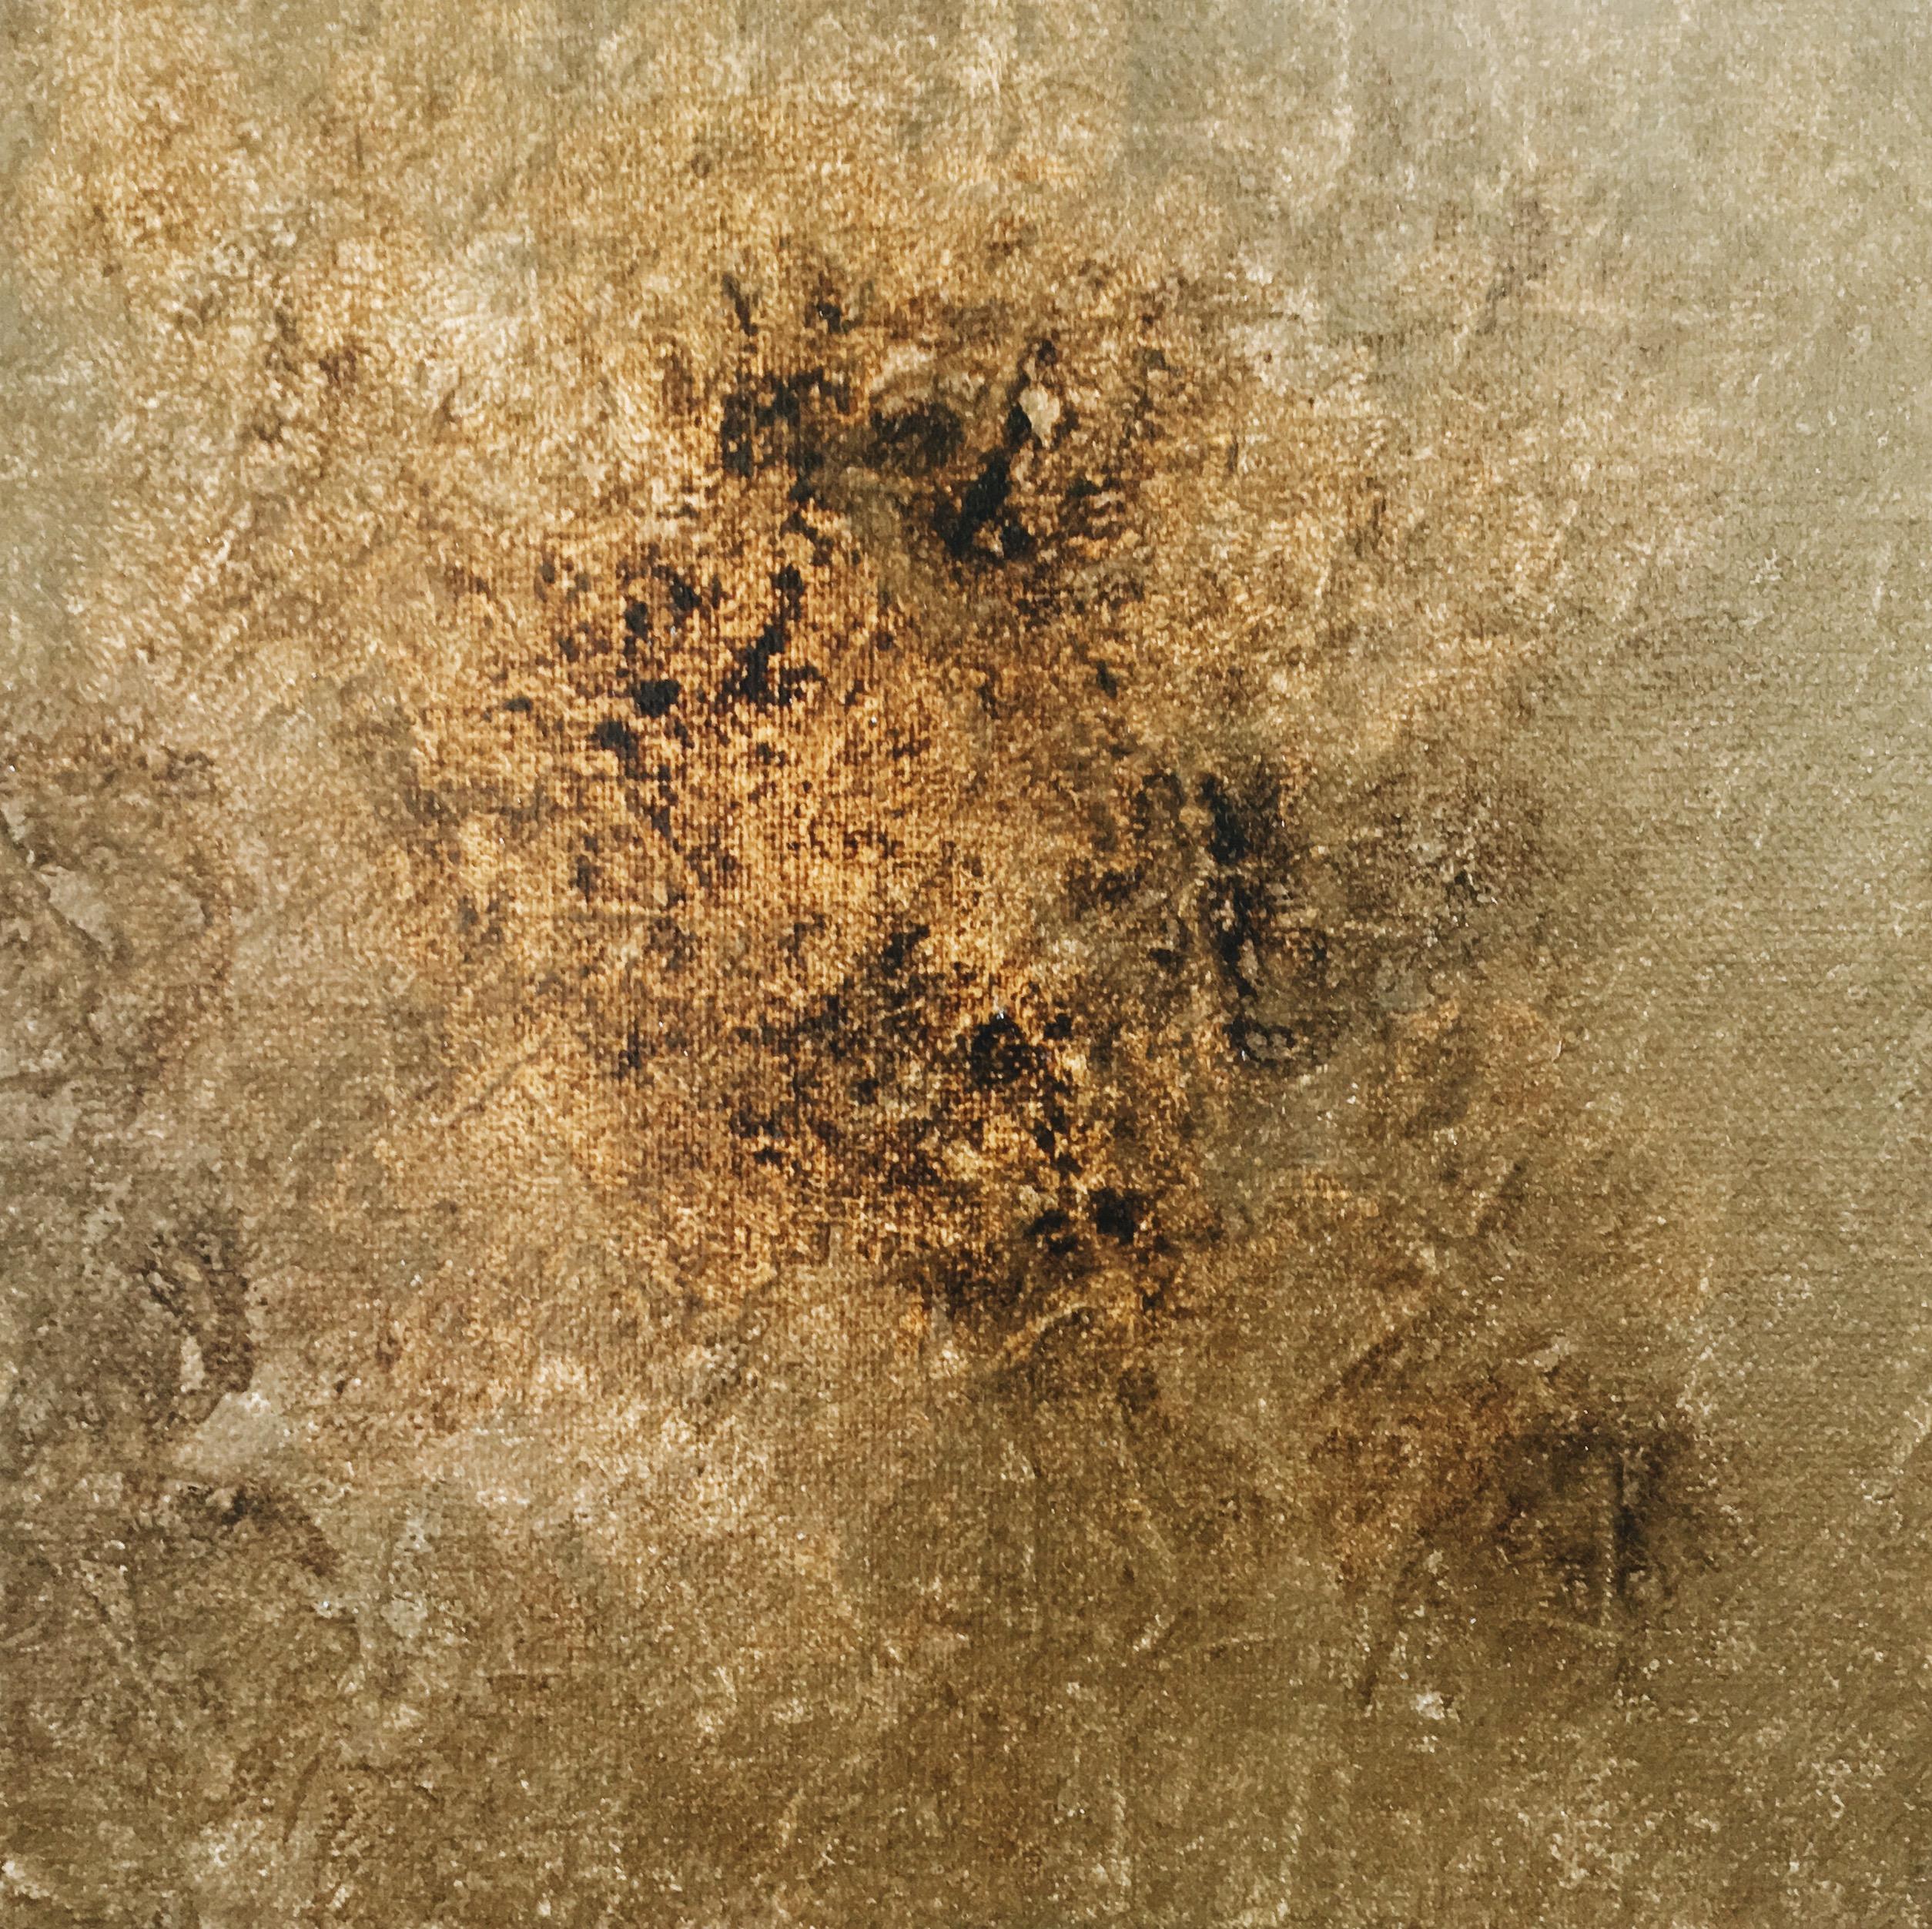 Marine Bonzom - Artiste Peintre Biarritz - 41